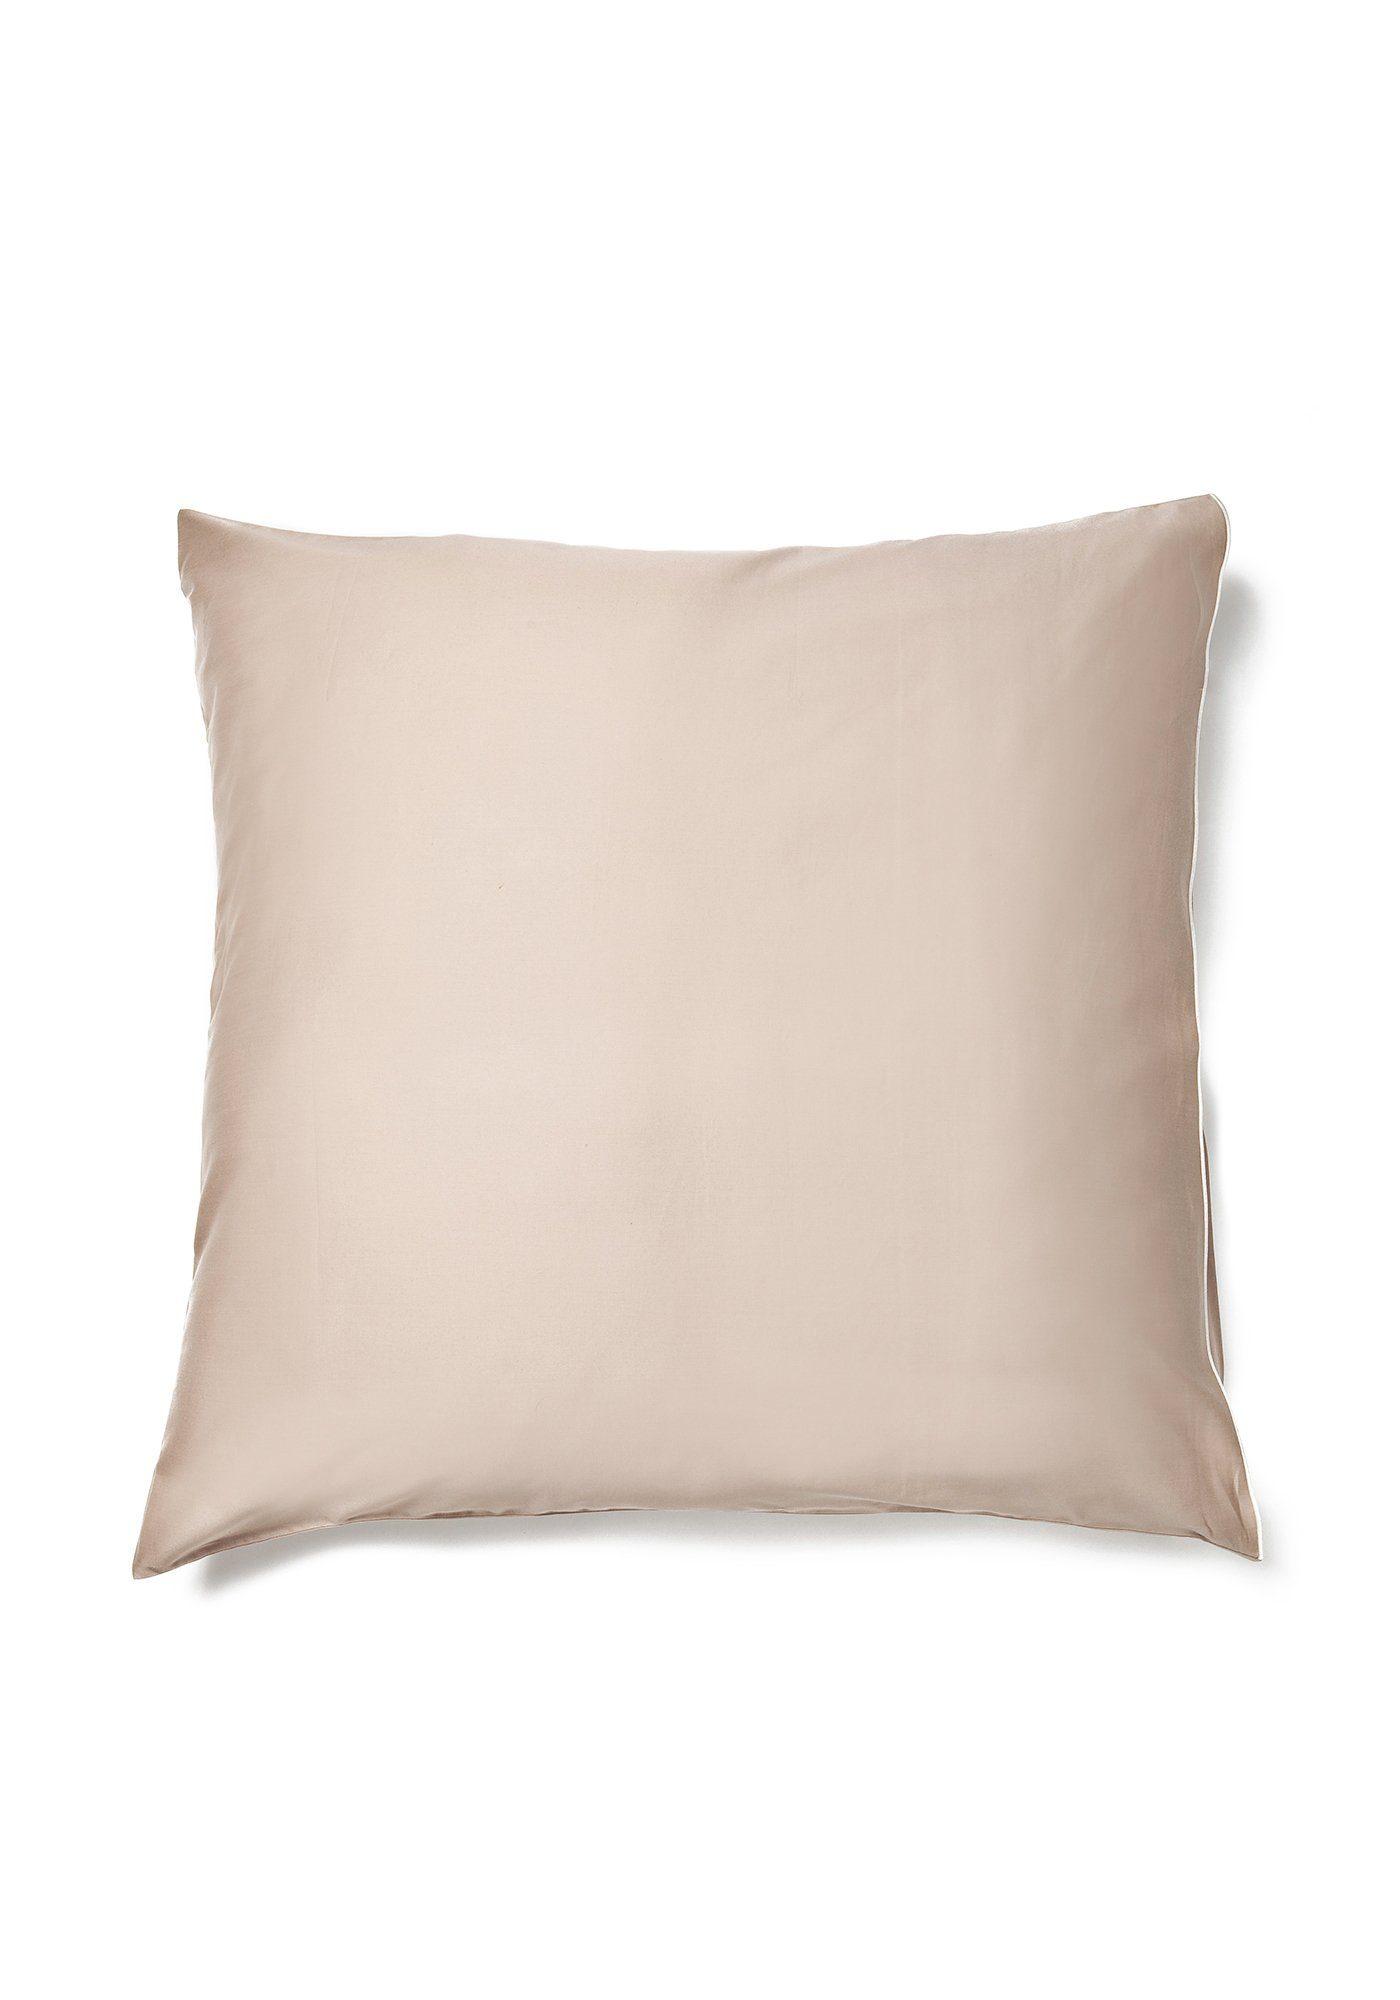 Kissenhüllen »in schlichtem Design«, Casa di Bassi, ÖkoTex 100 Standard 100